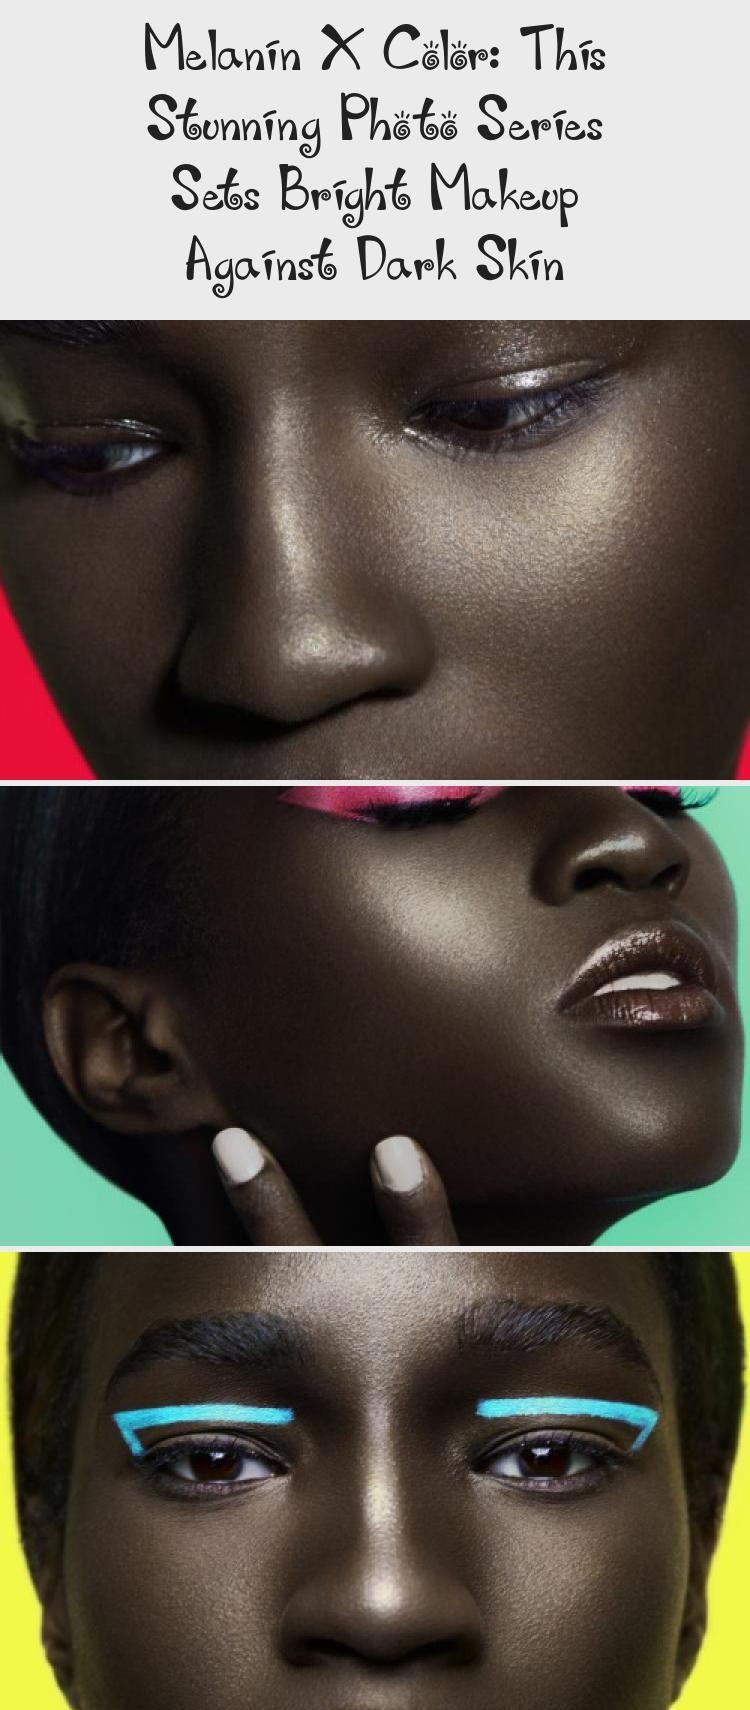 Melanin X Color This Stunning Photo Series Sets Bright Makeup Against Dark Skin Darkskinbeautybraids Darkskinbeautyoutfits Darkskinbeautyconcealer Mediumda